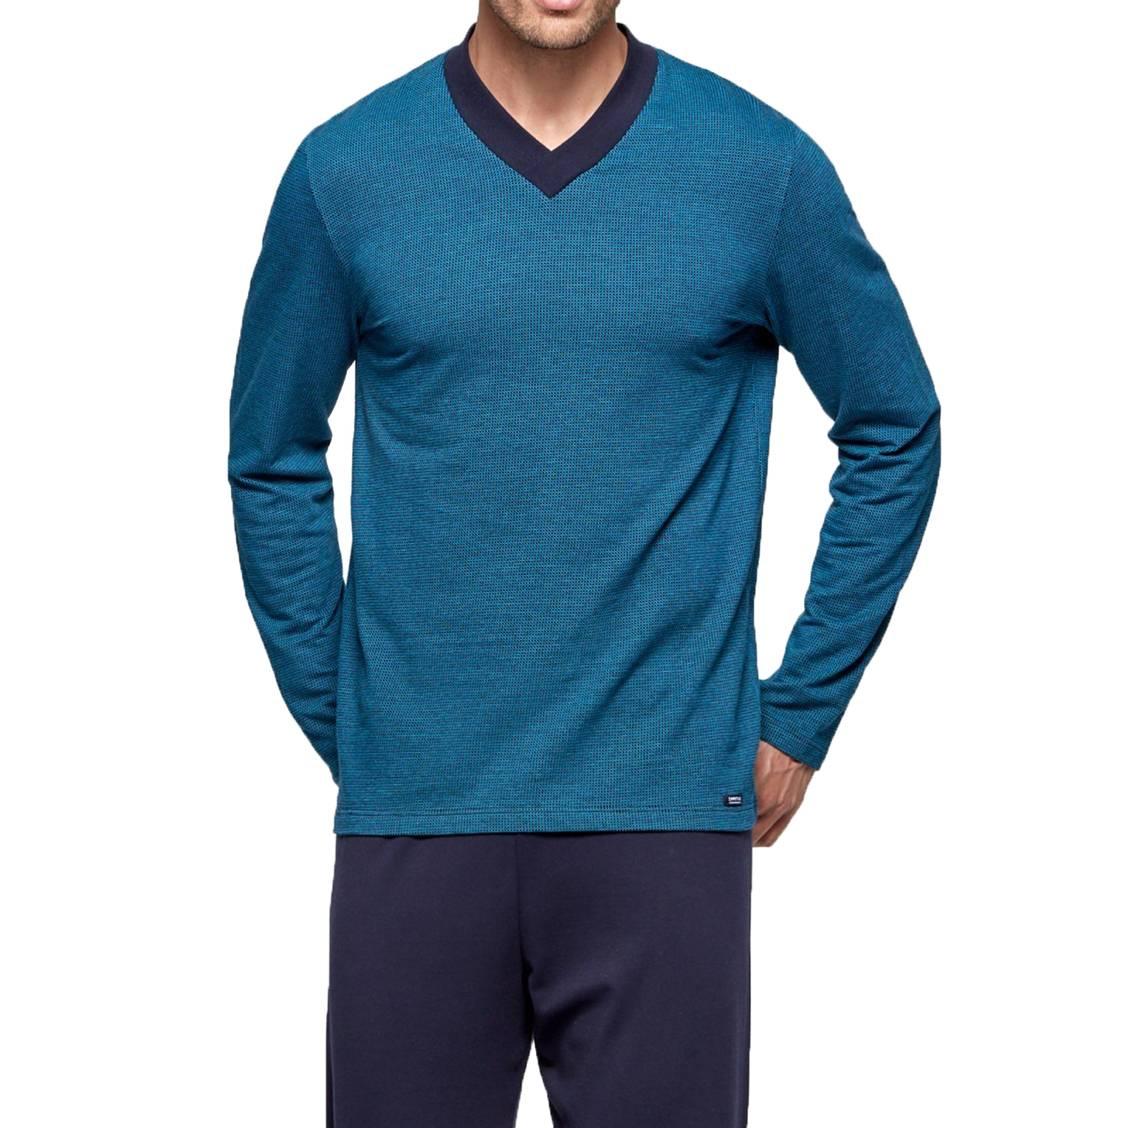 2622259d23246 Pyjama_long_Impetus_en_coton_tee-shirt_manches_longues_col_V_bleu_marine_a_carreaux_bleu_cyan_et_pantalon_bleu_marine-1-0_1128x1128.jpg